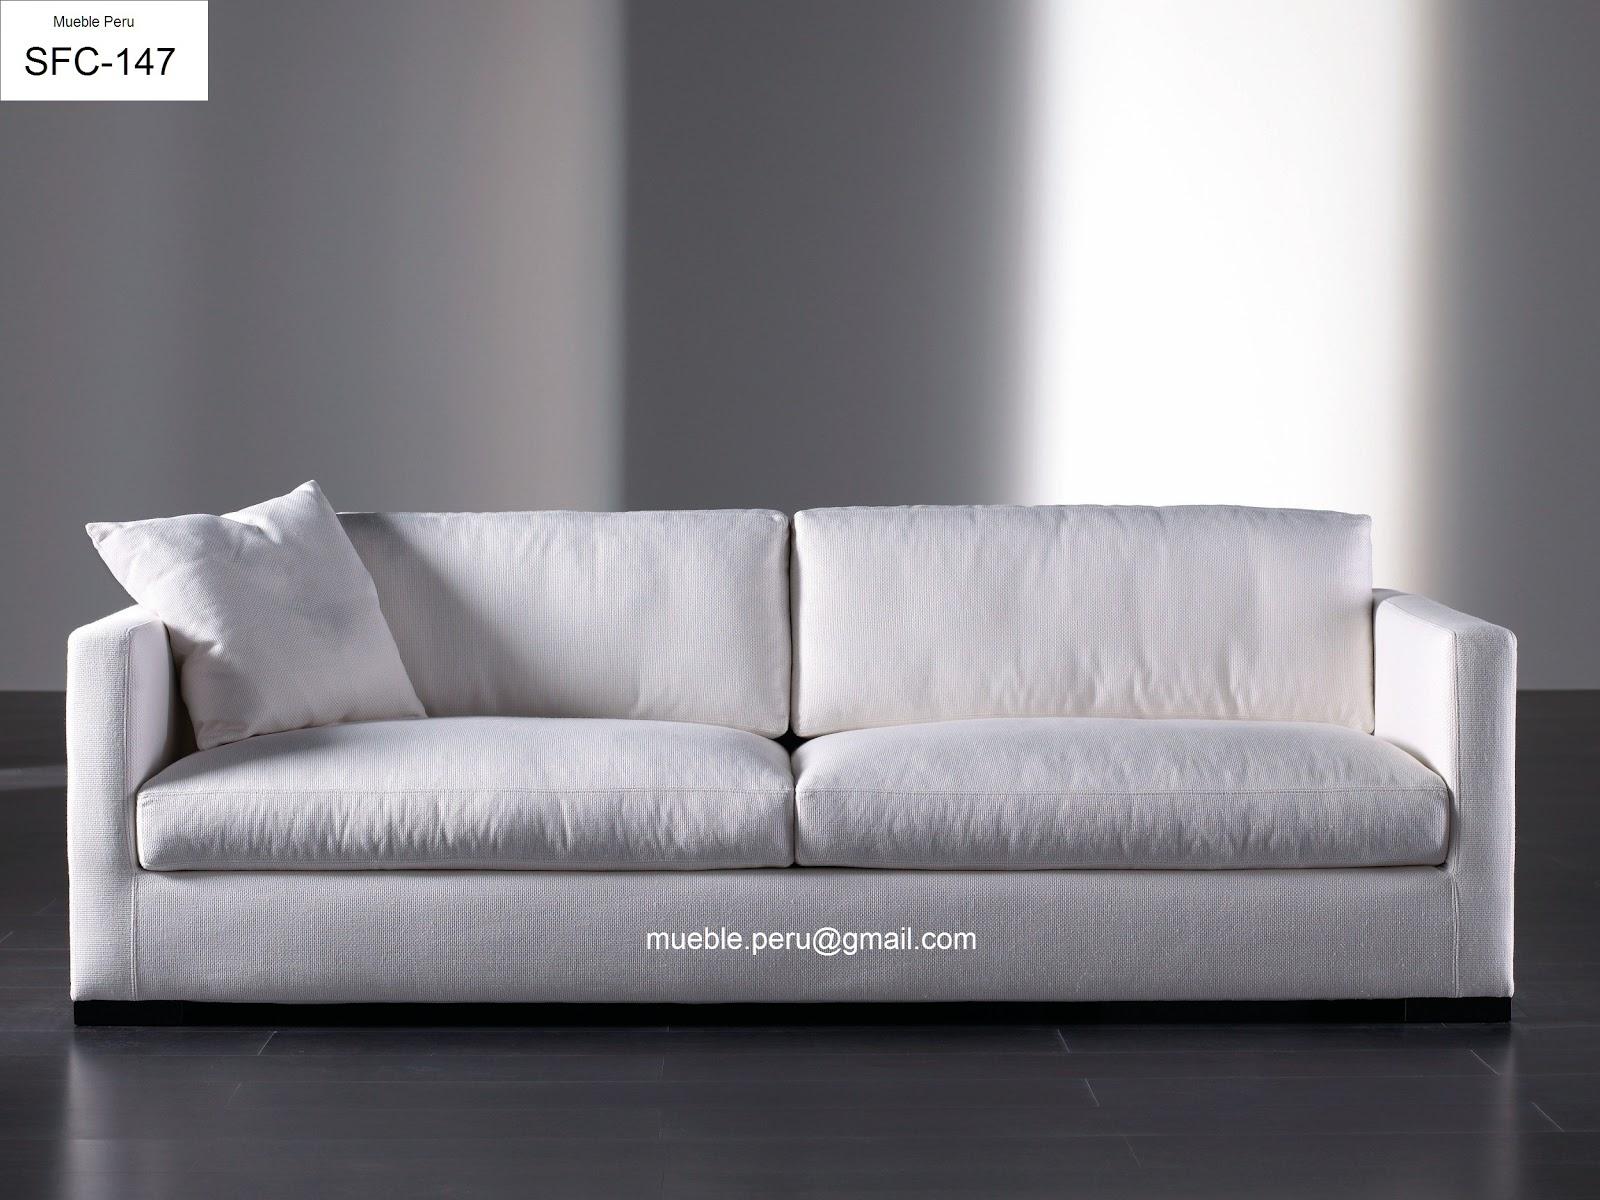 sofa sfc how to remove water stain from microfiber mueble perÚ muebles de sala sofas cama con entrega a